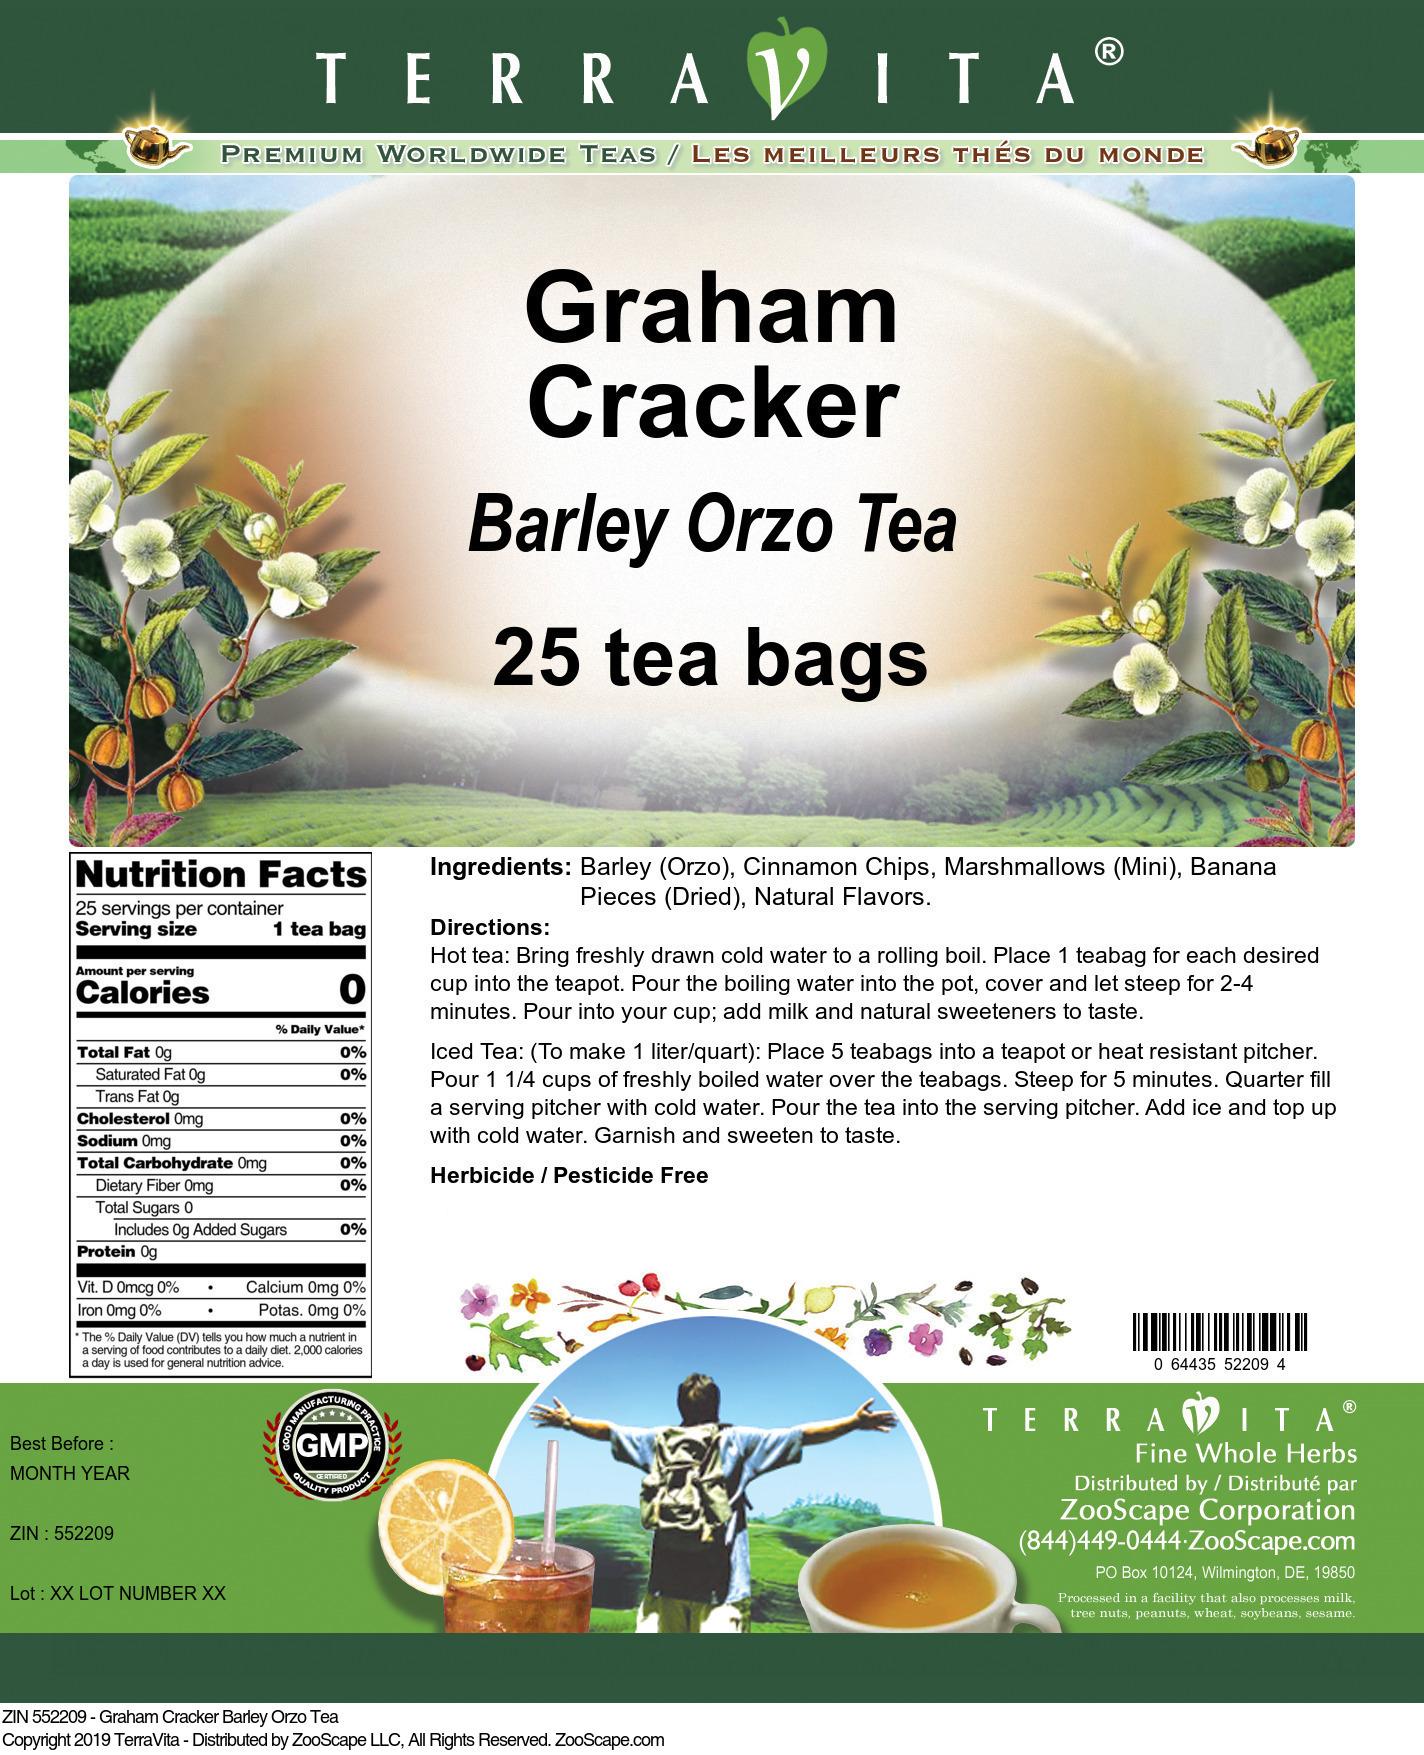 Graham Cracker Barley Orzo Tea